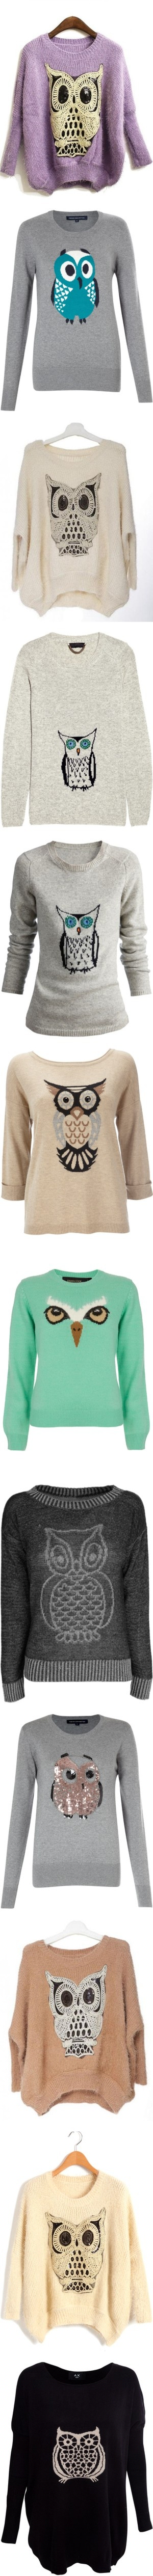 """owl shirts"" by elizabethnae on Polyvore"